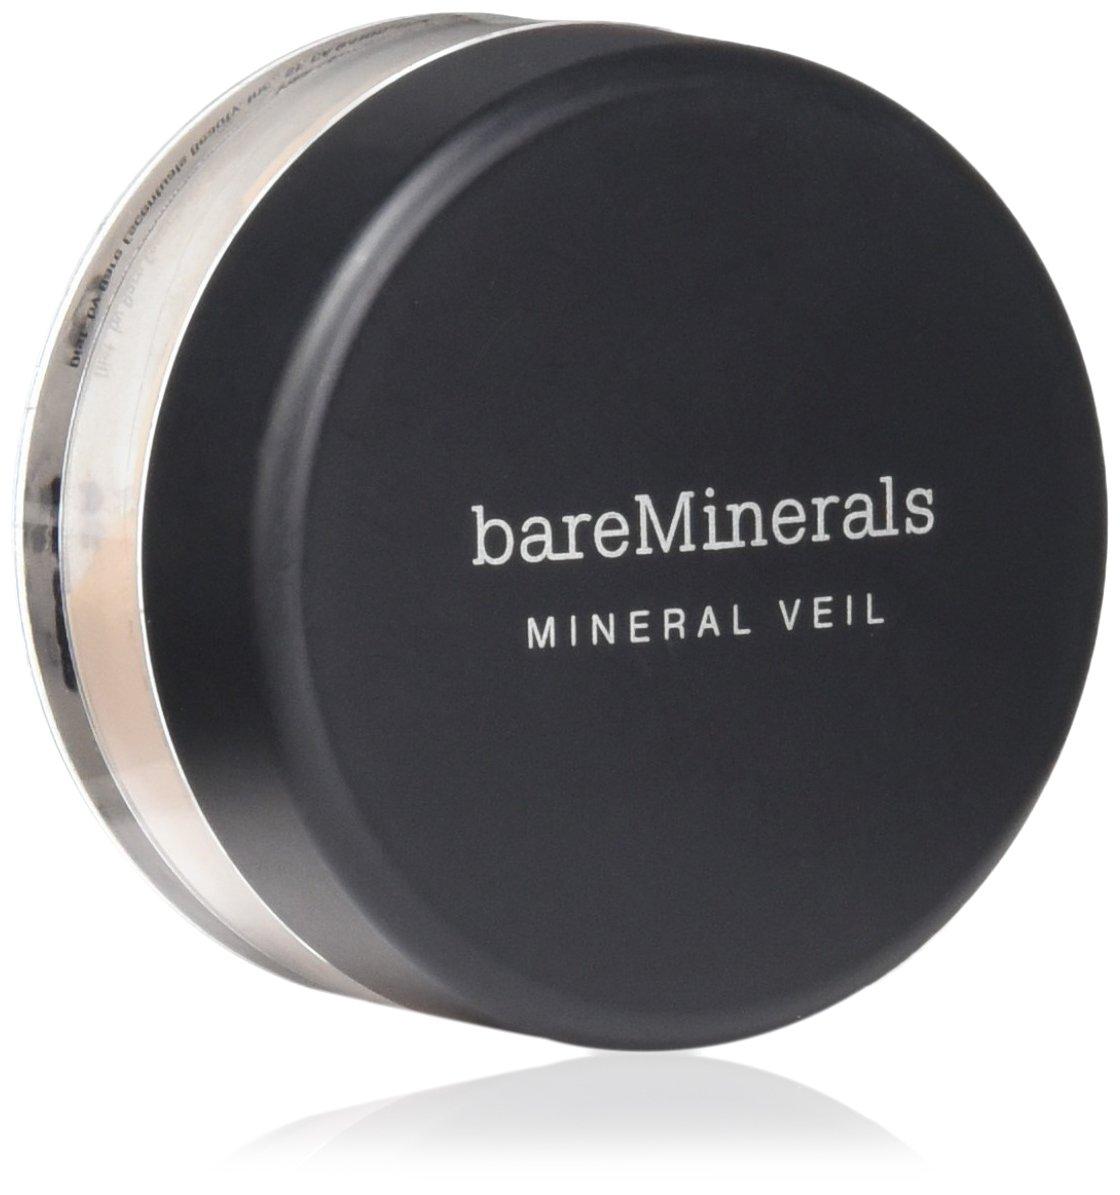 Baremineral Original Mineral Veil - 3g